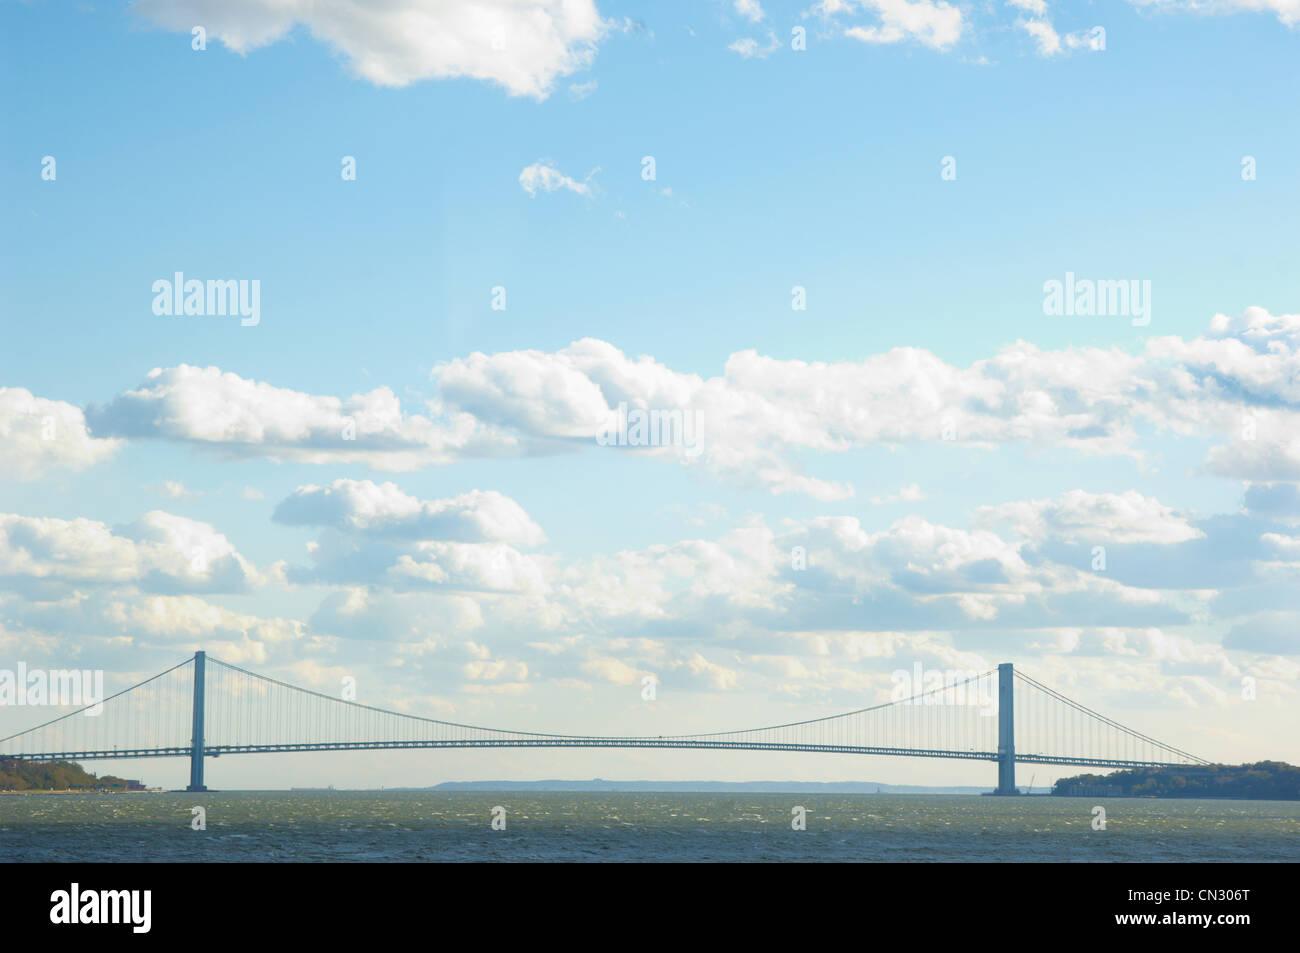 Verrazano-Narrows Bridge, New York, USA - Stock Image